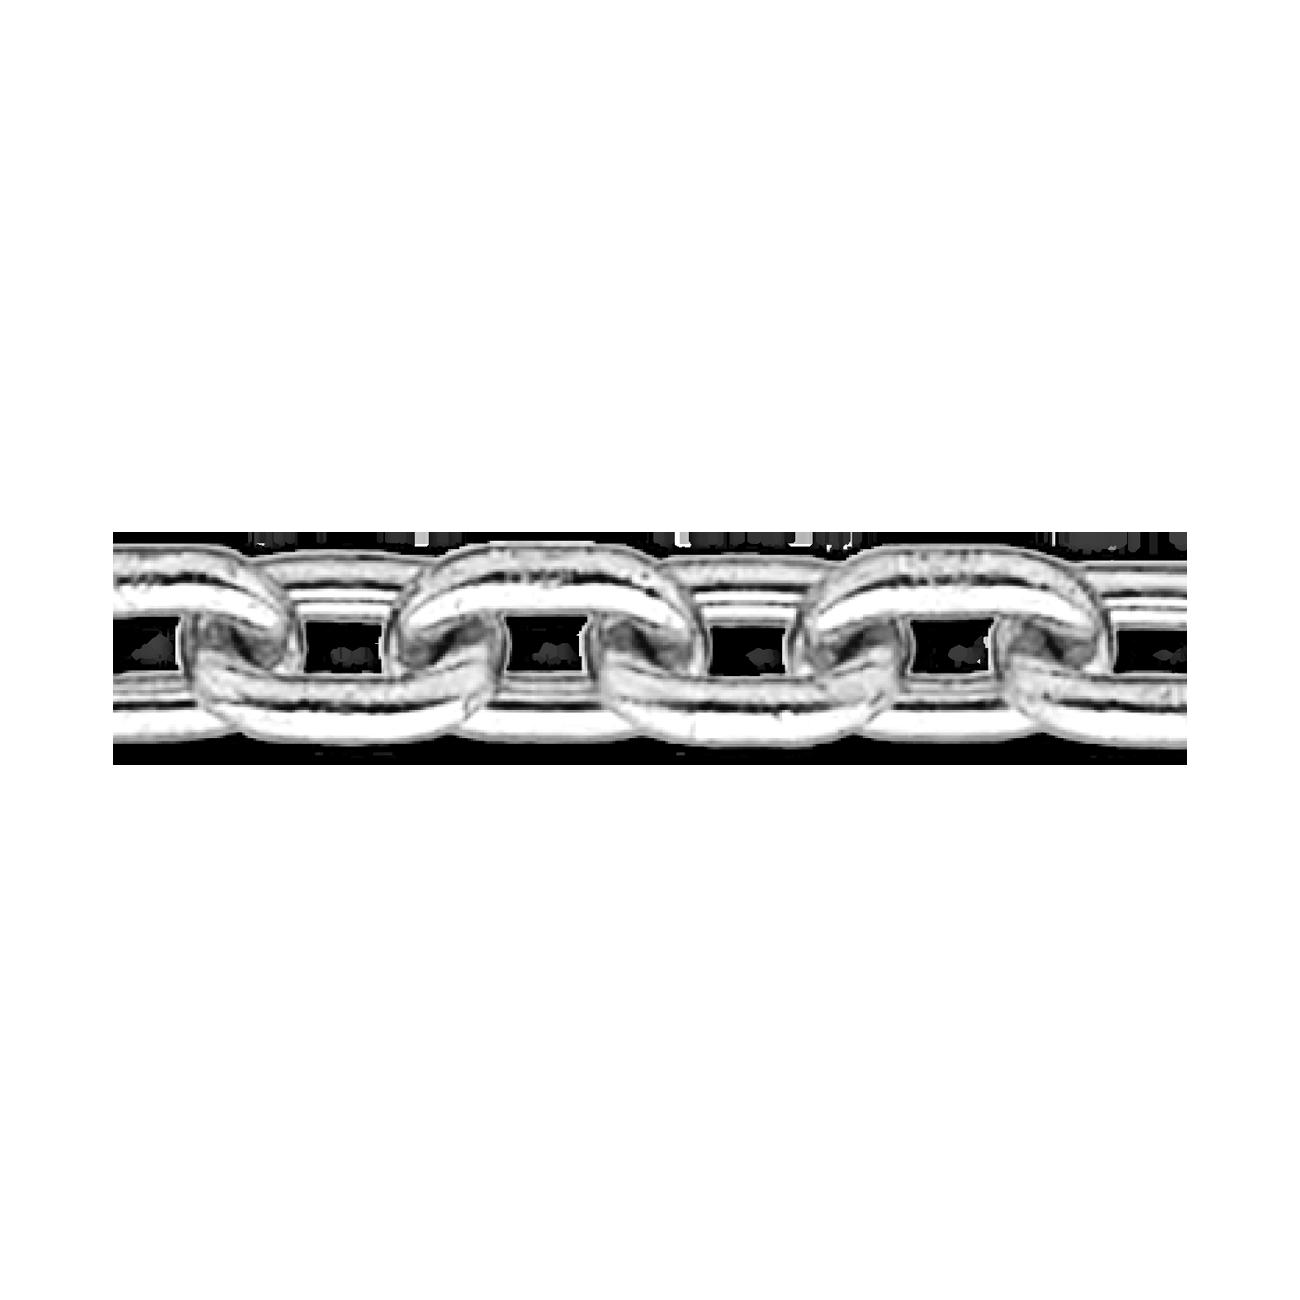 Lant Standard Zale Scurte Tip 766 5 18 5 17 Colac 30m Zincat